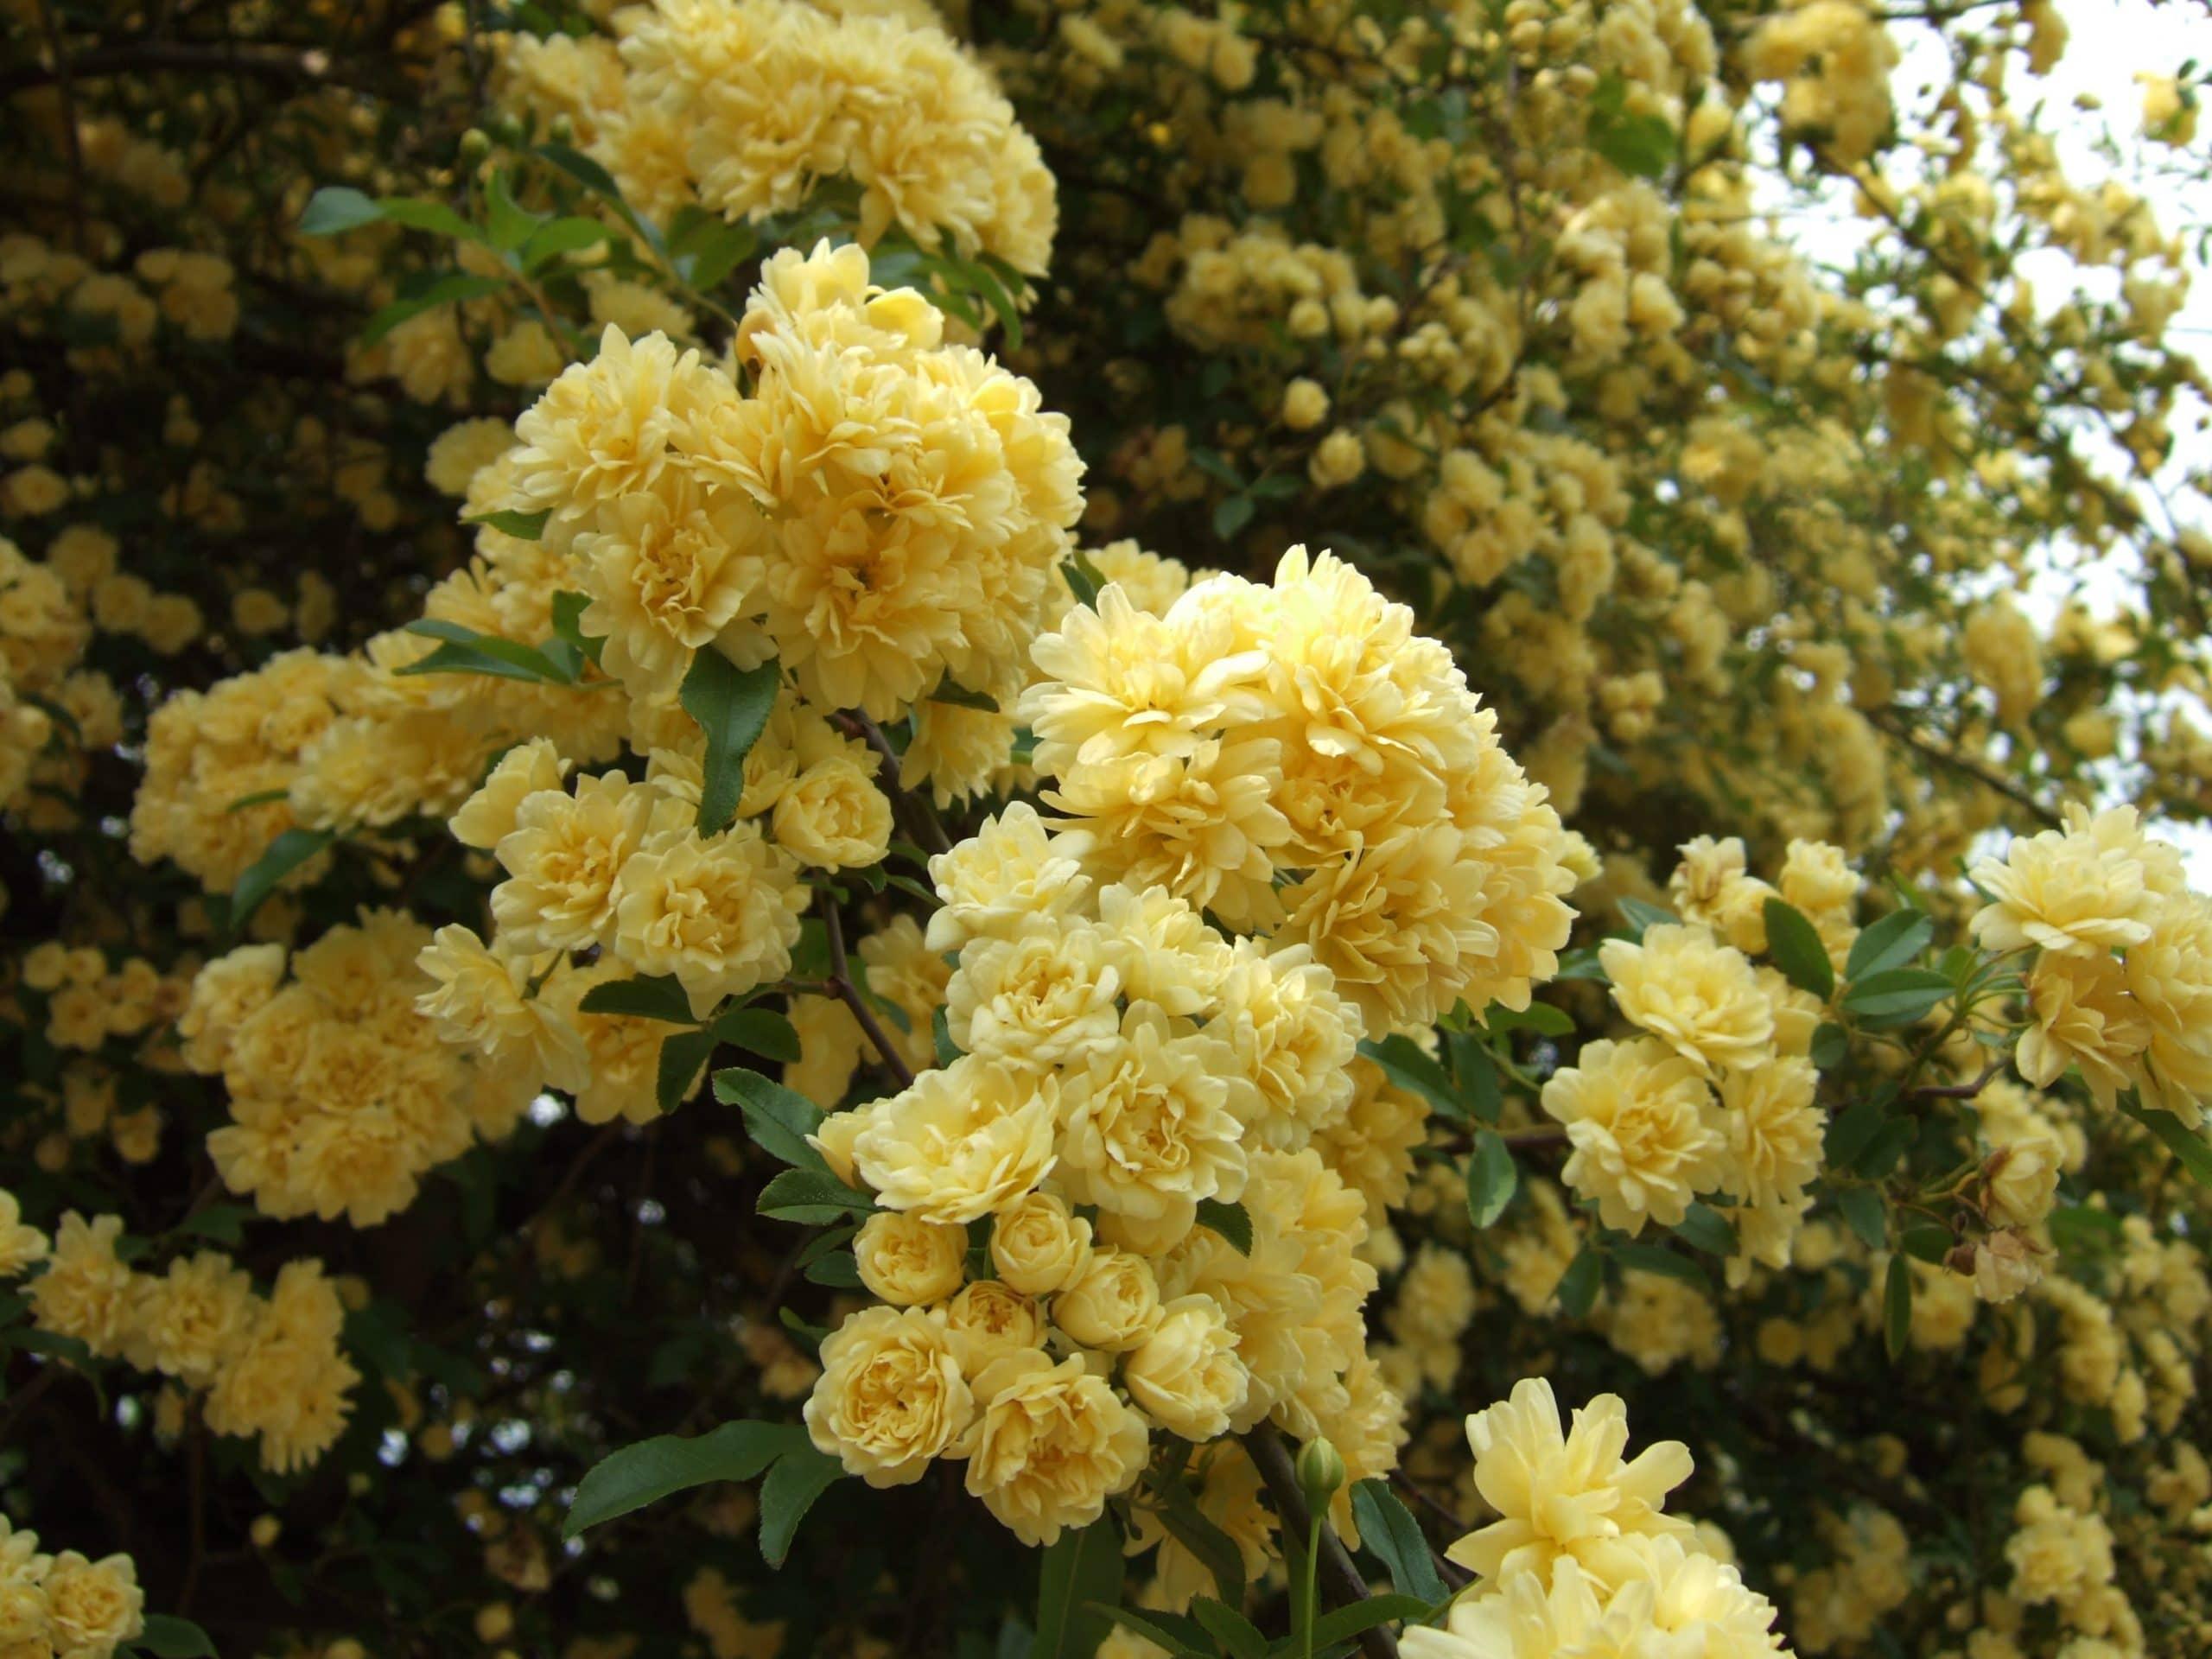 Ejemplar en flor de Rosa banksiae var. lutea